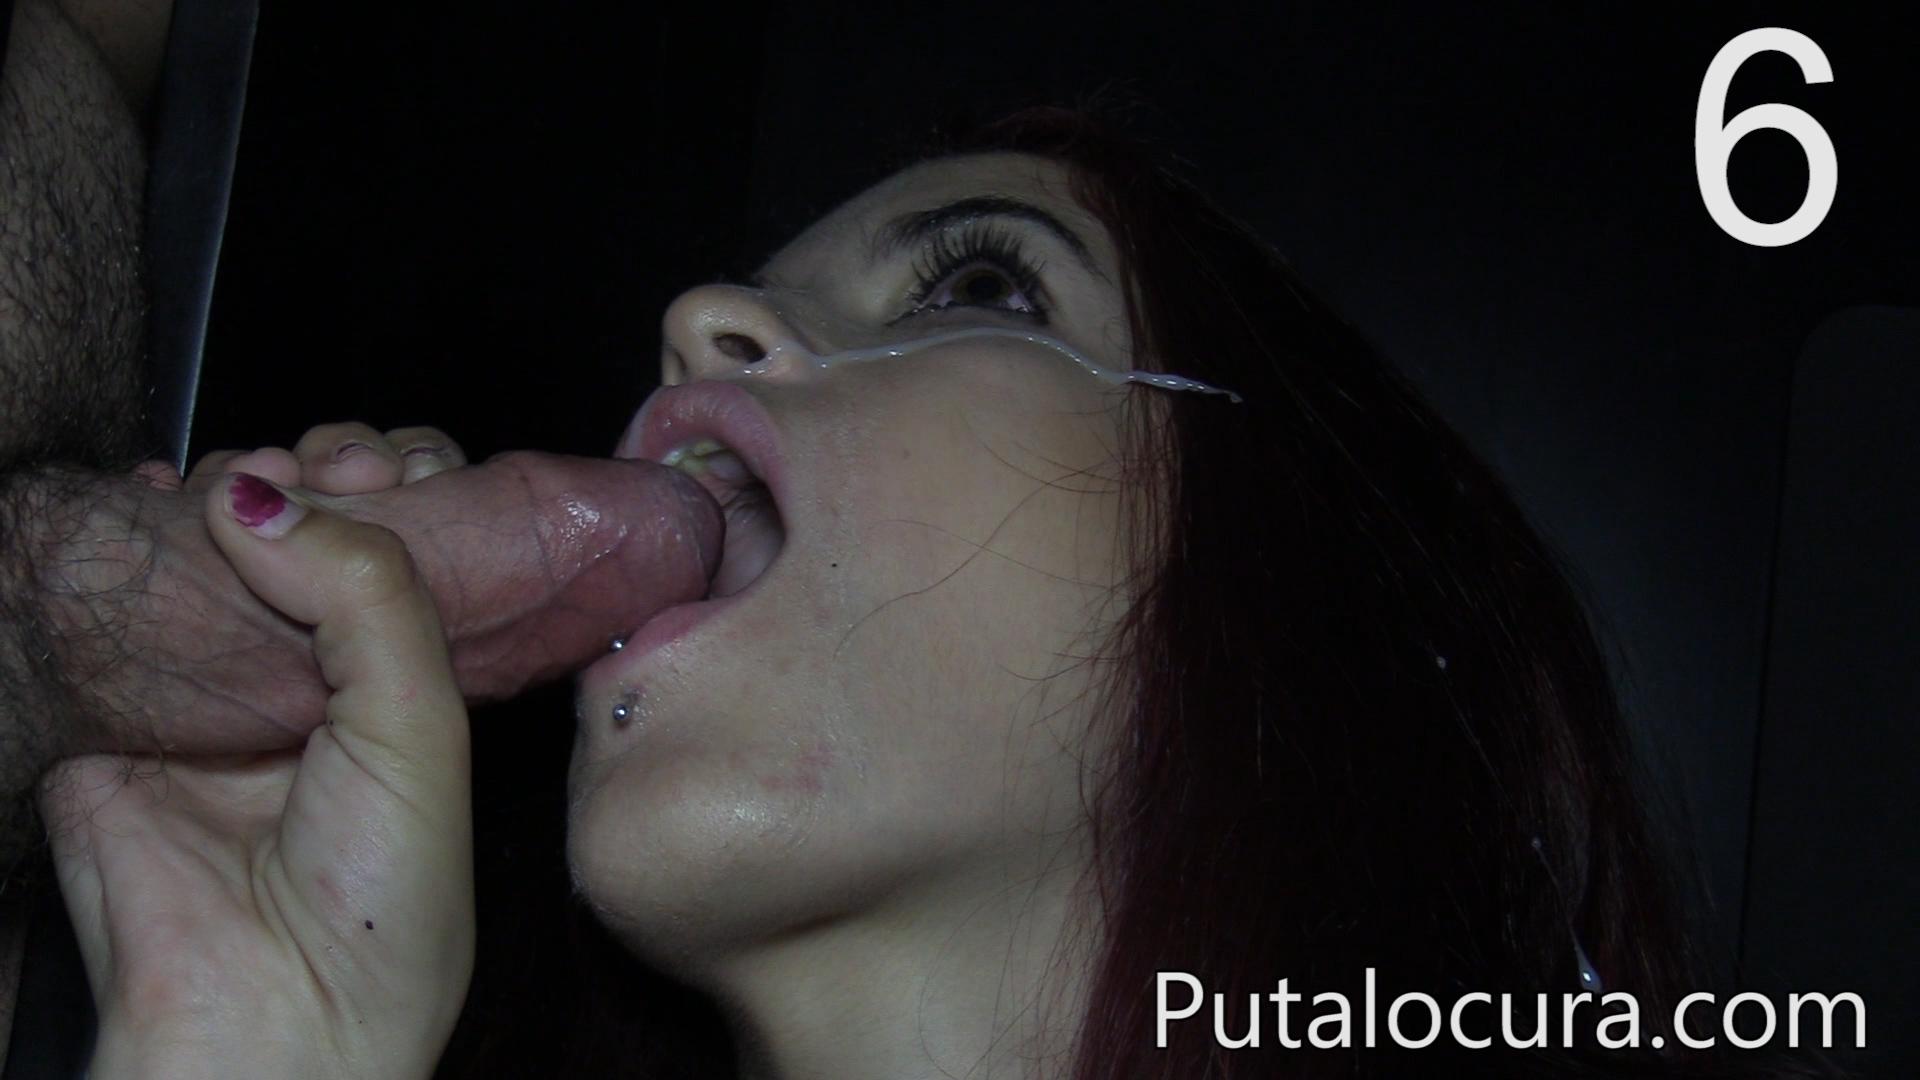 Porn xvideos Porn games Free porn Spanish porn Porn Tape amateur Sex videos  Spanish porn videos Pussy Sex tape Voyeur Oral sex